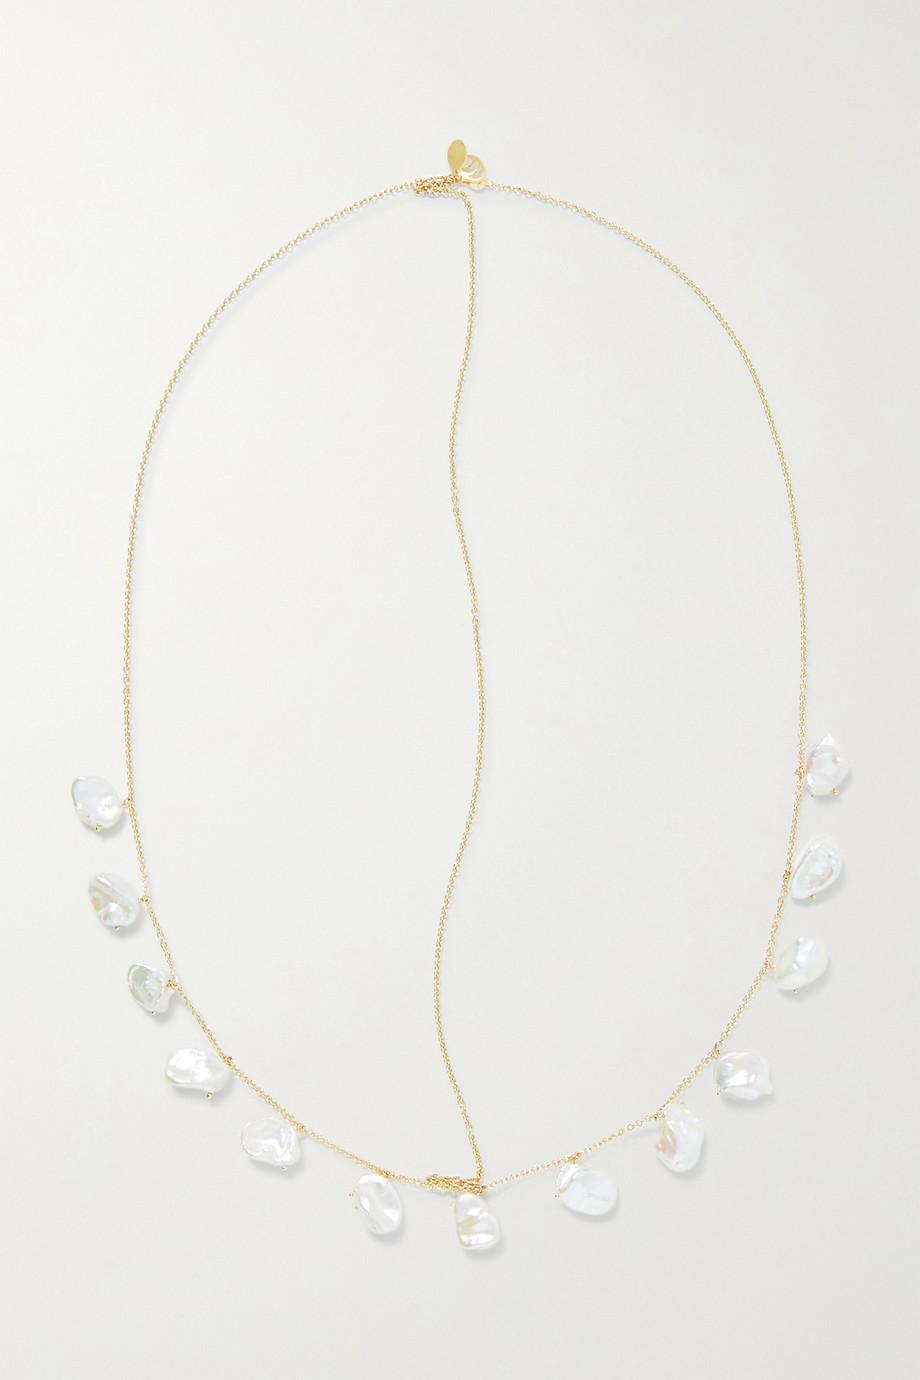 Charms Company Bijou de tête en or 14 carats (585/1000) et perles Pearls of Joy